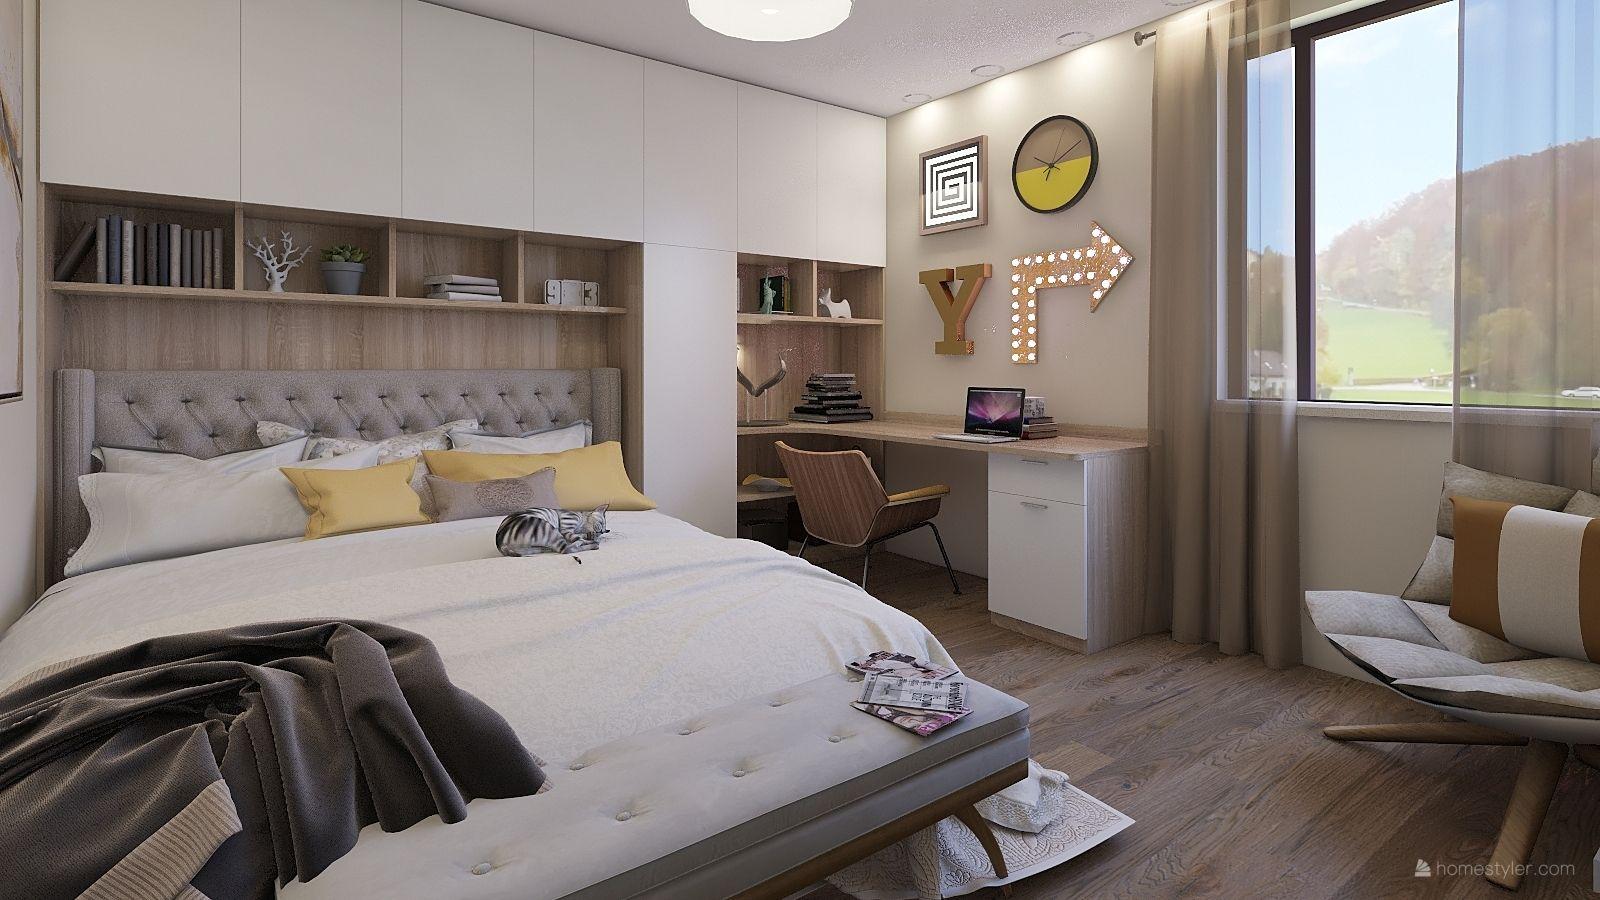 Fresh bedroom design by Geovana Alochio | 3d home design ...